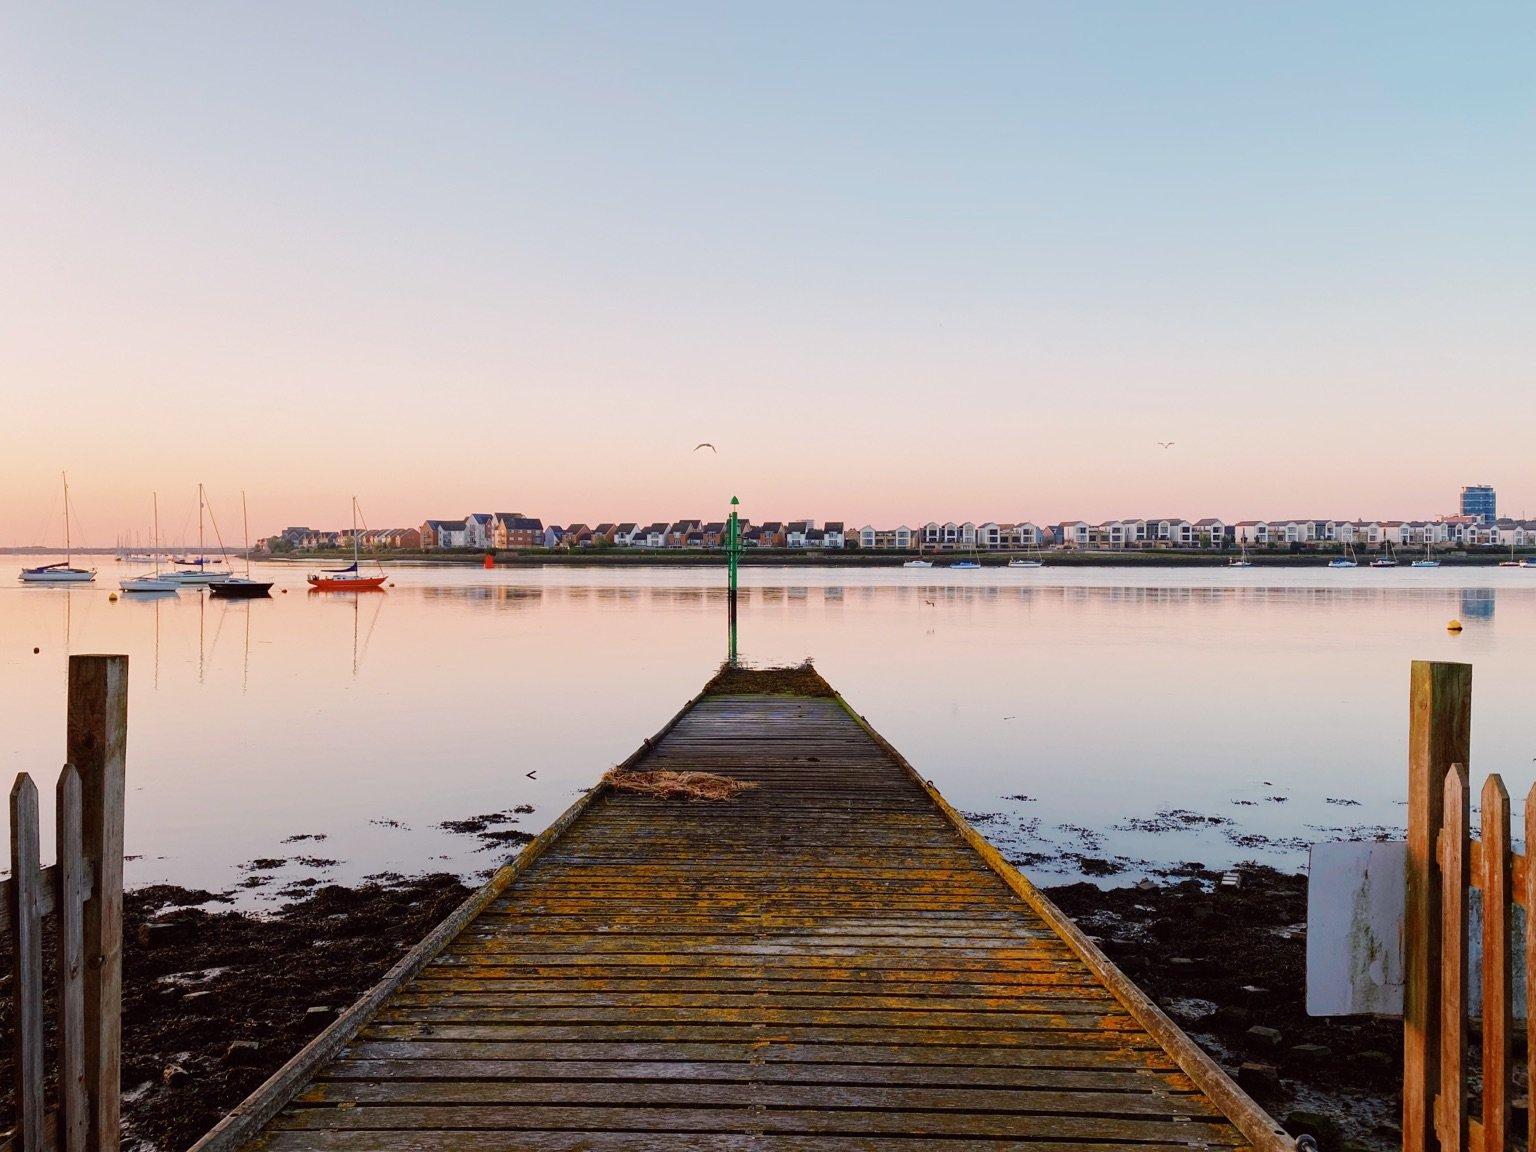 Upnor pier